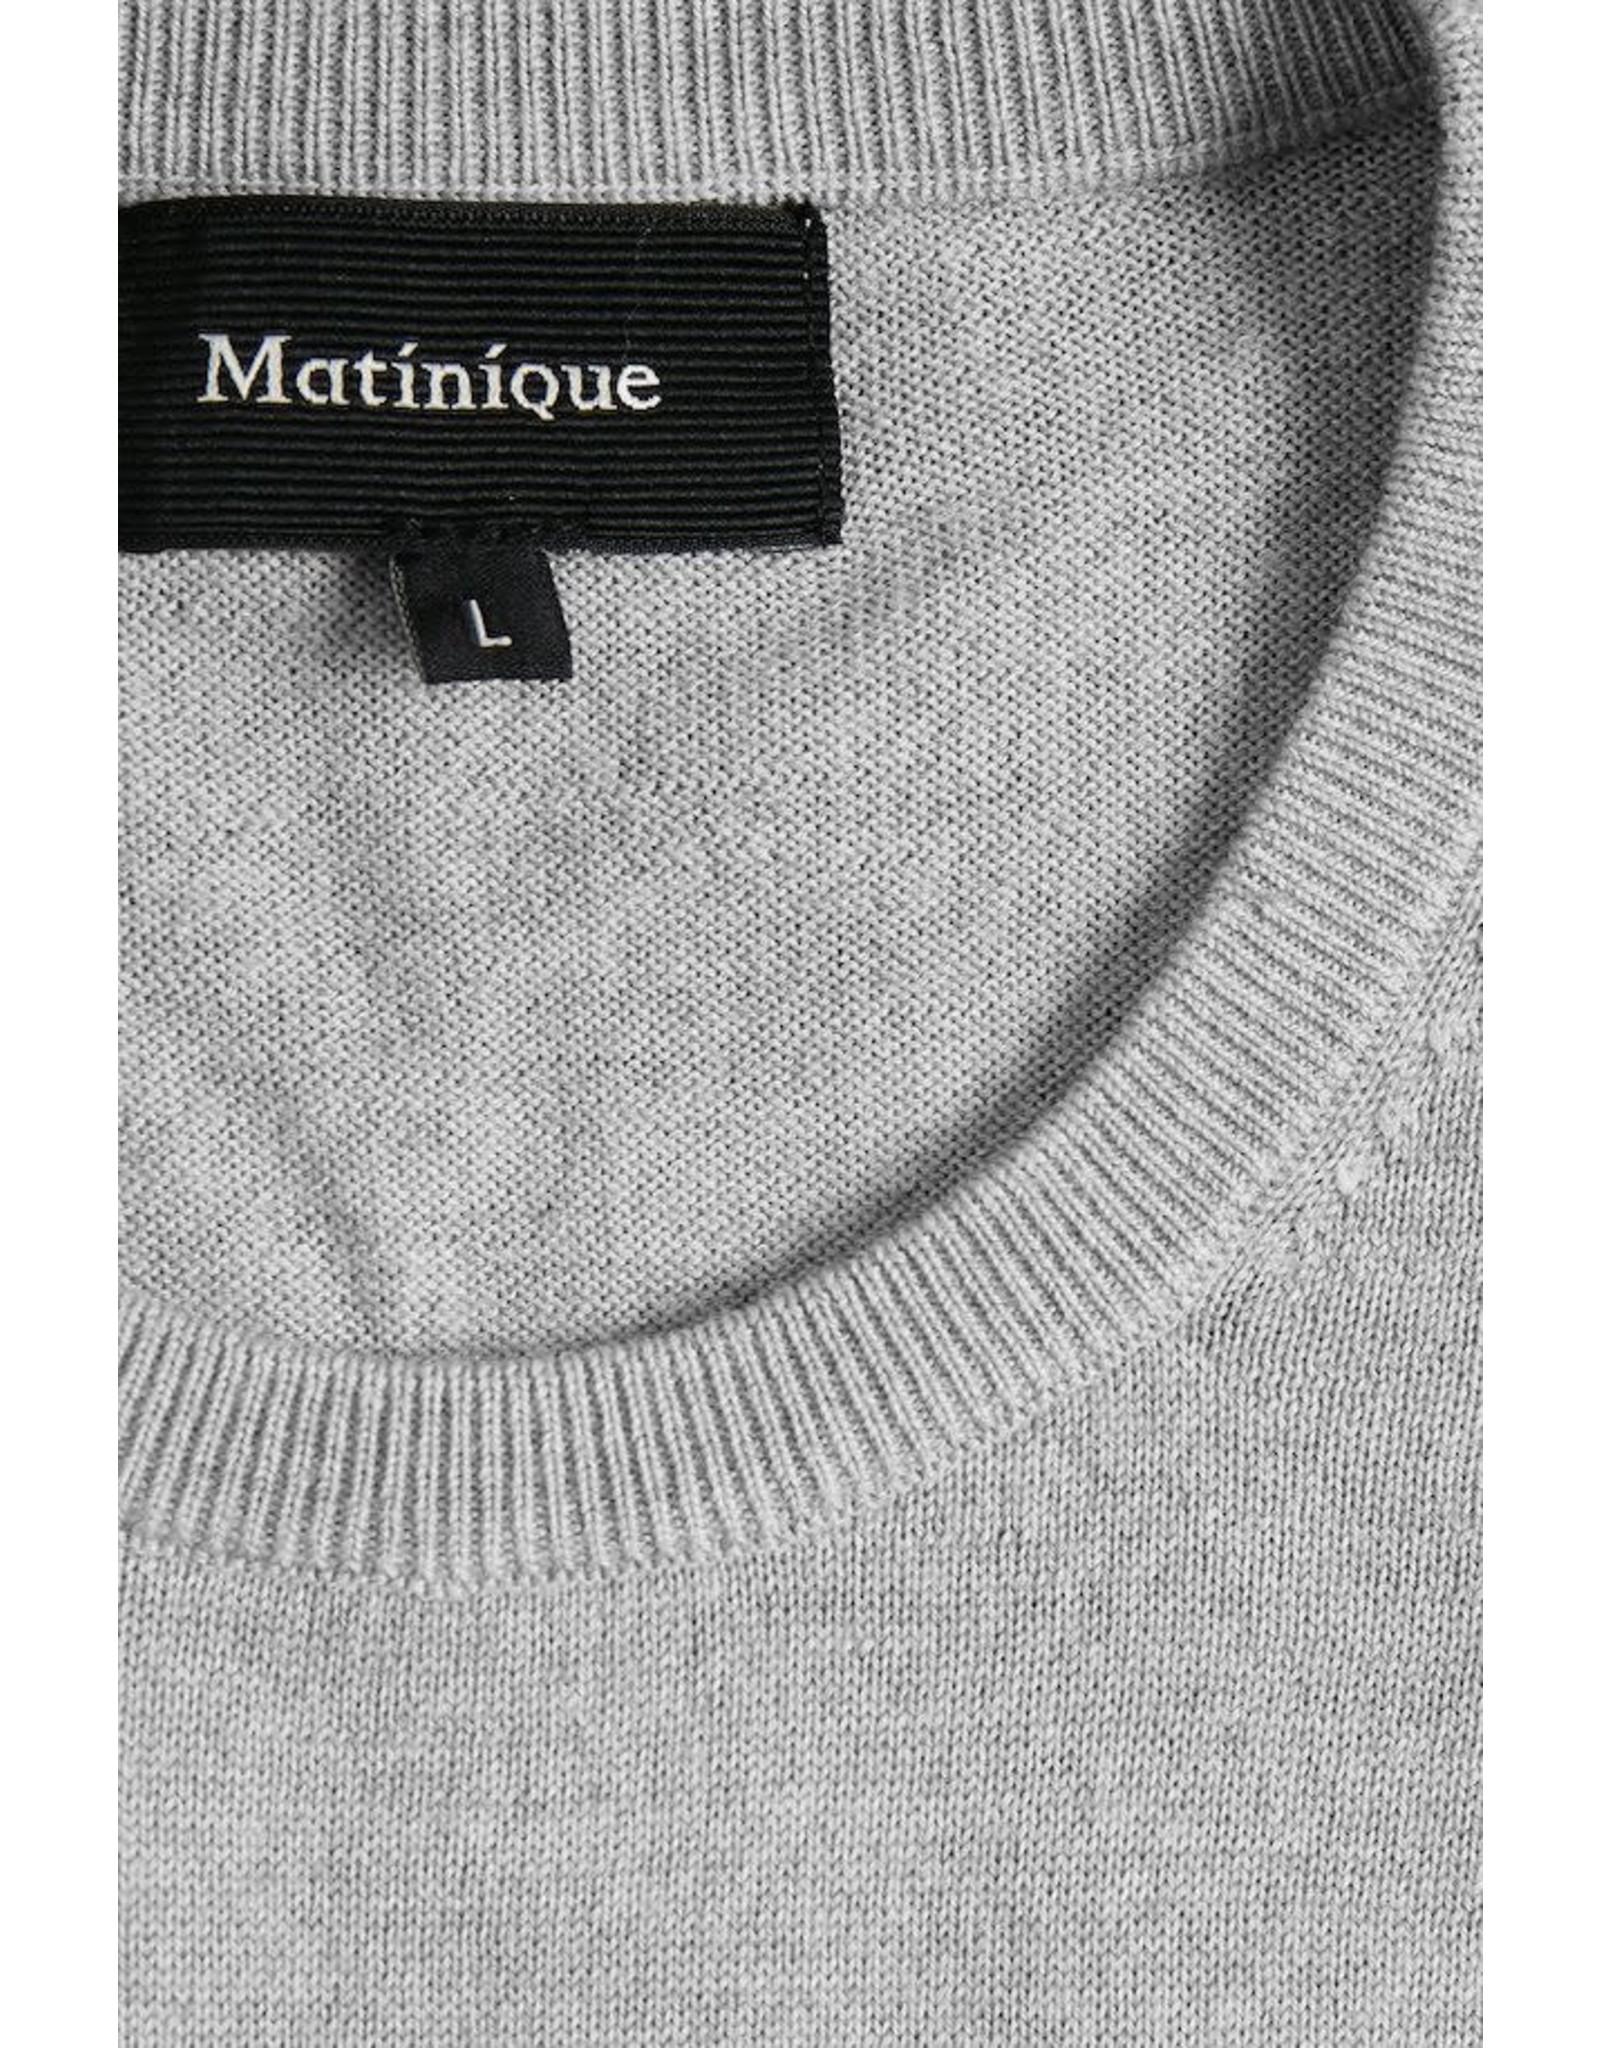 Matinique Margrate Merino Knit